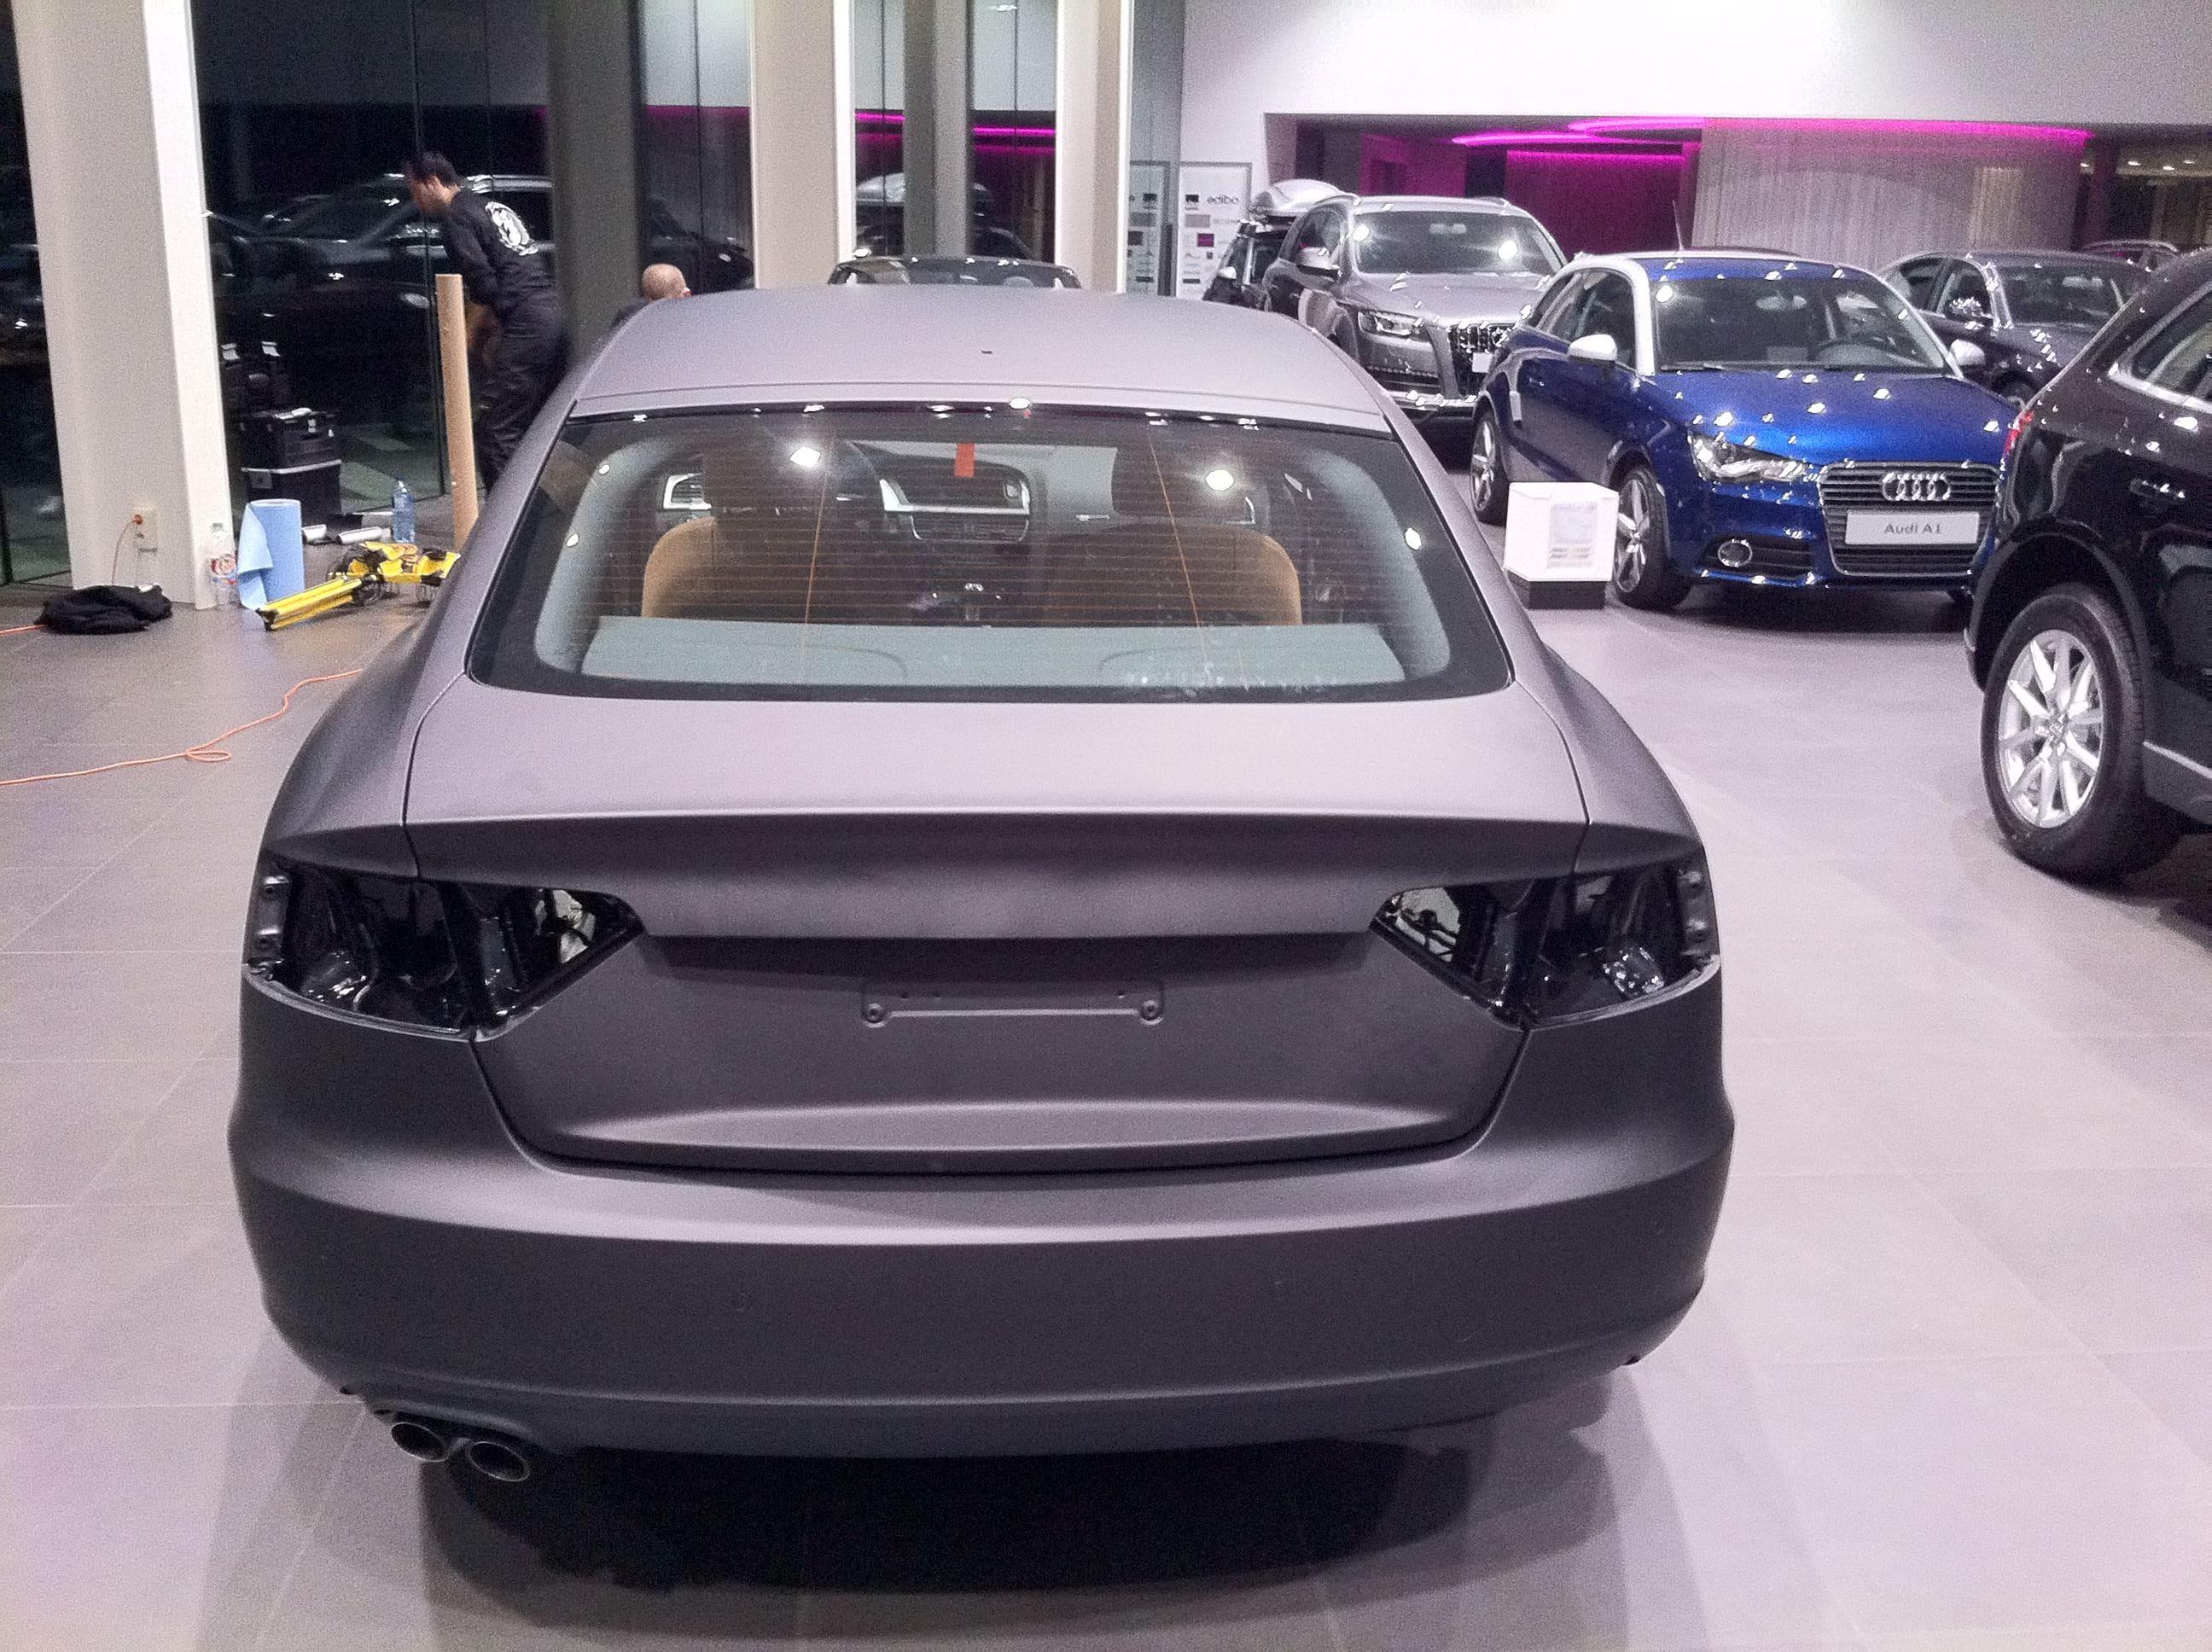 Audi A5 Sportback met Mat Grijze Wrap, Carwrapping door Wrapmyride.nu Foto-nr:4789, ©2021